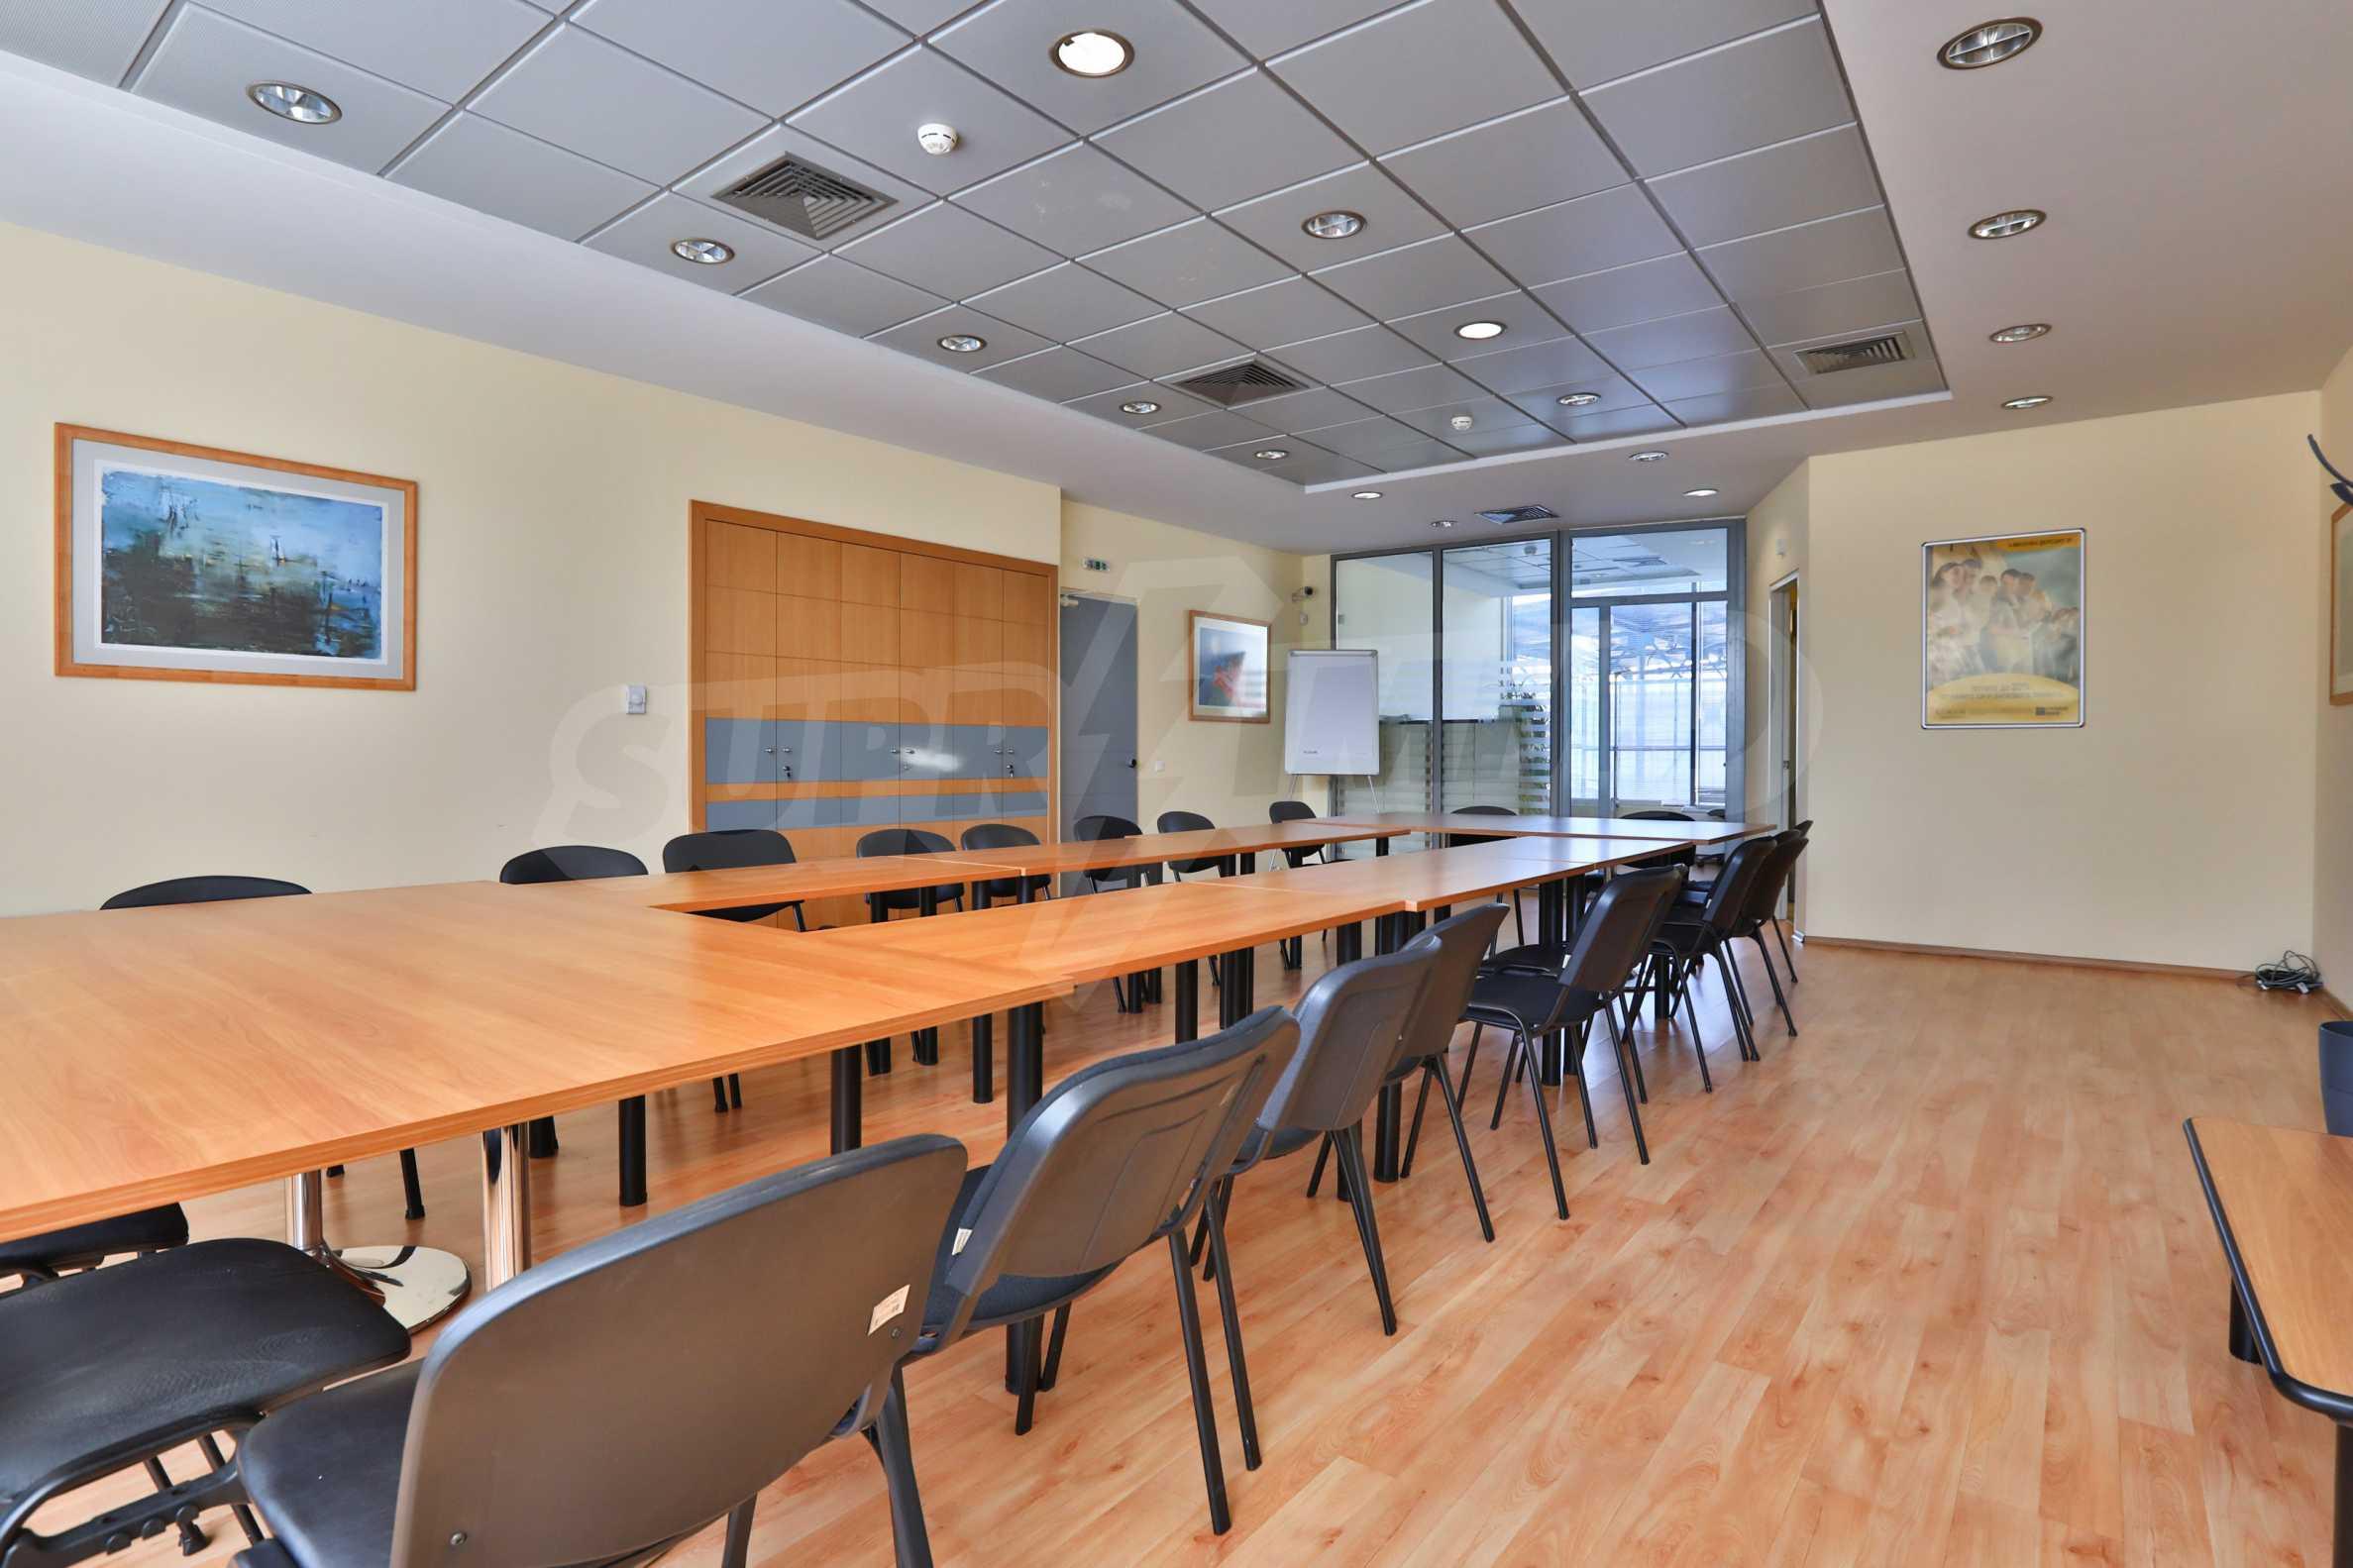 Офис в бизнес сграда висок клас на бул. Цариградско шосе 4